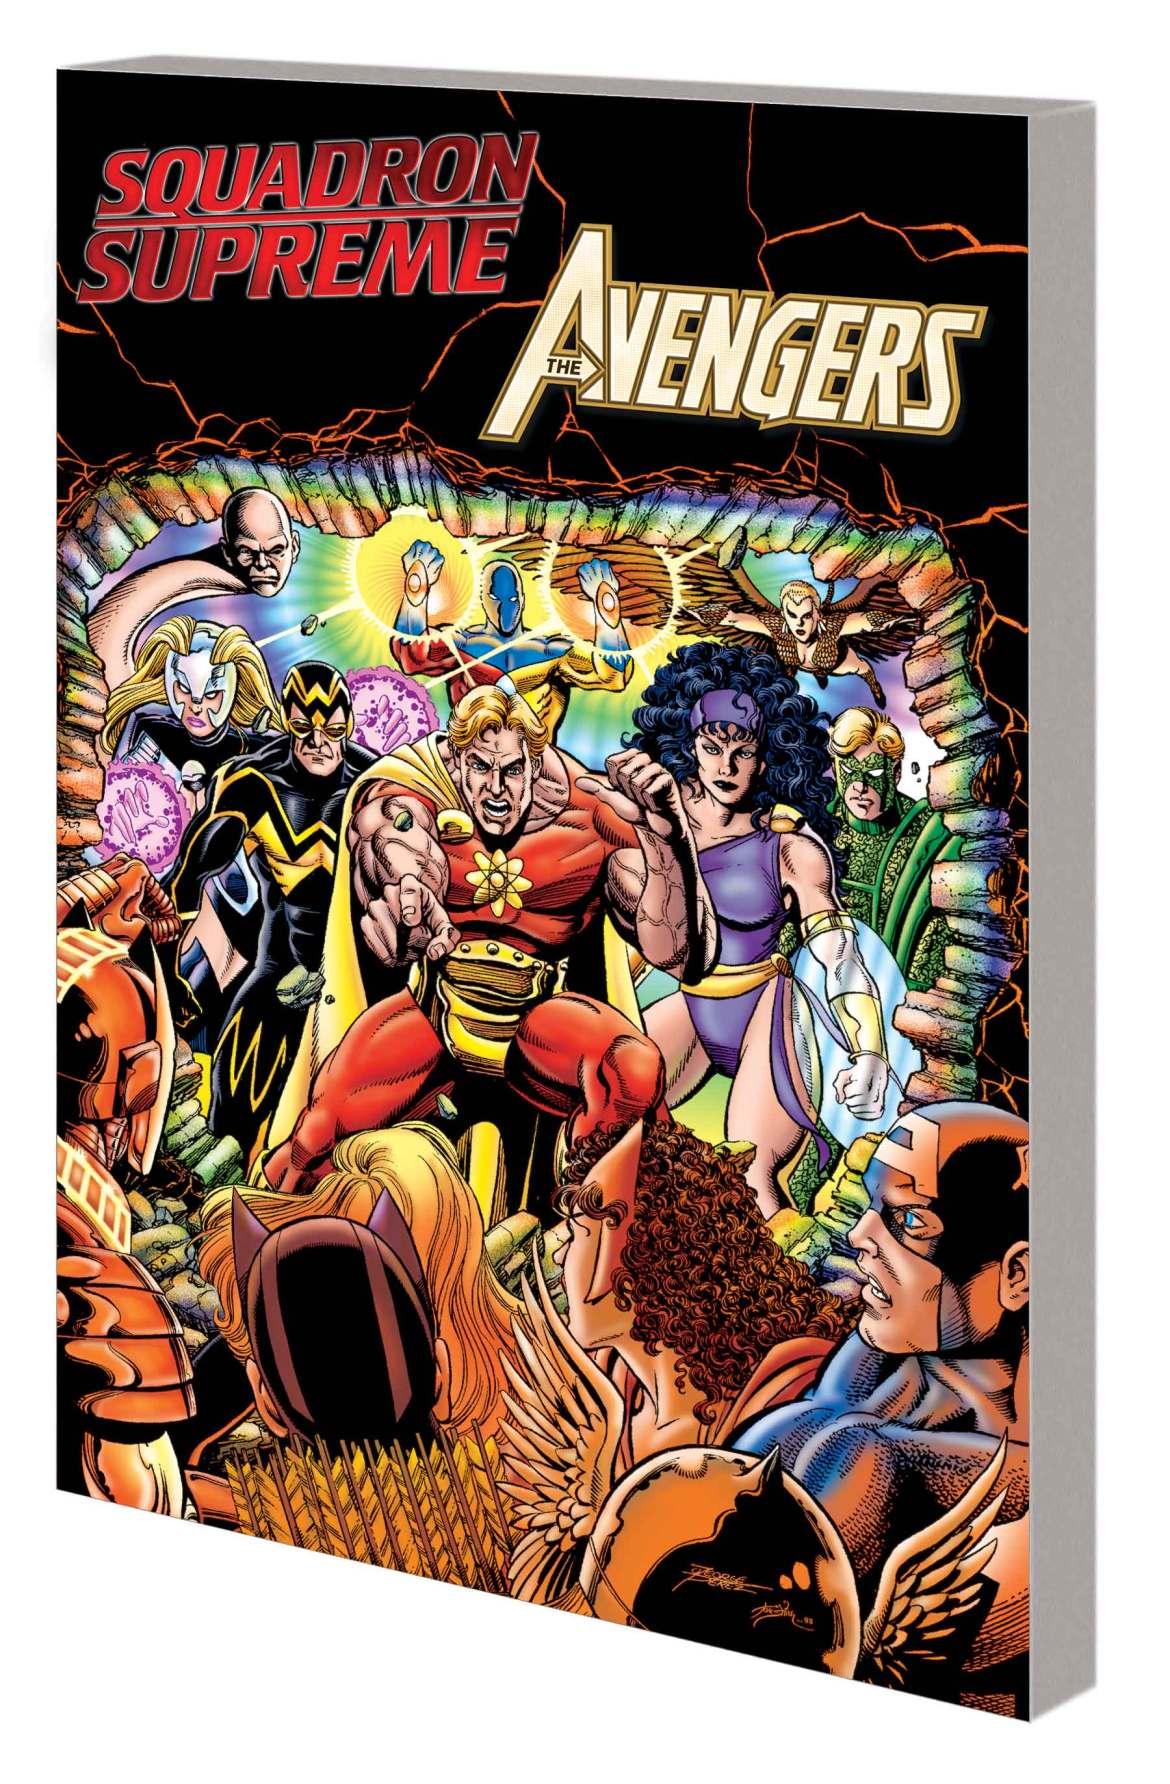 SS_vs_AVENGERS_TPB Marvel Comics May 2021 Solicitations